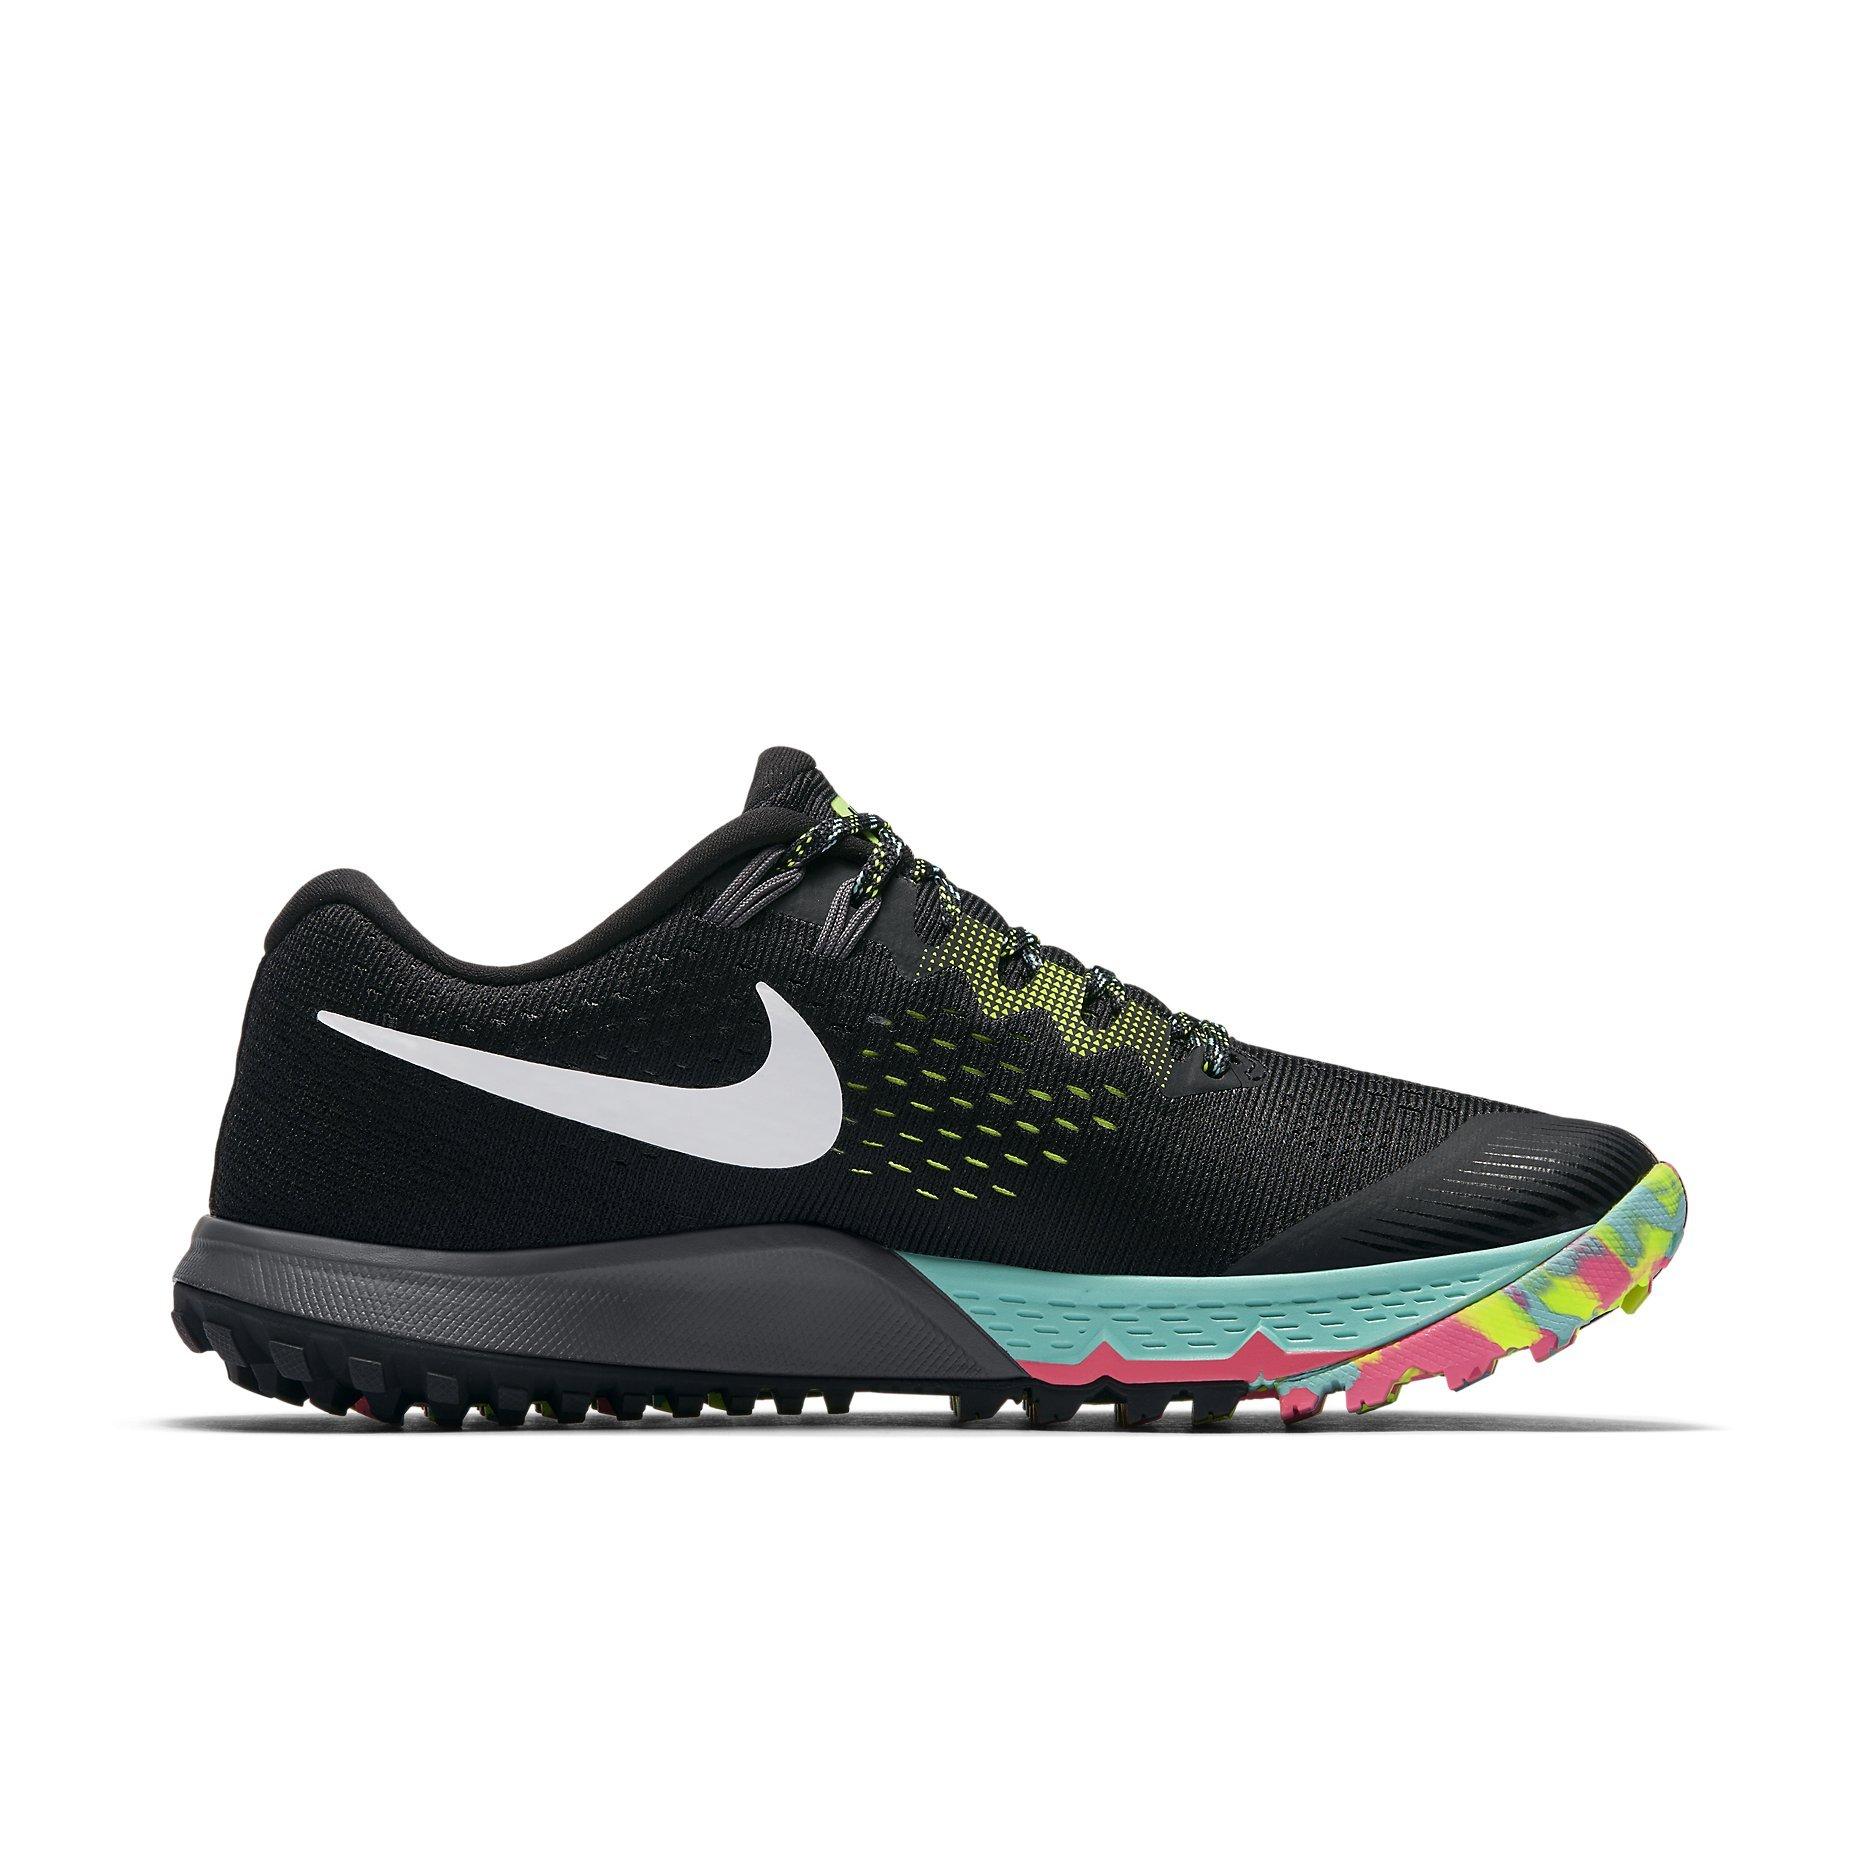 8aa489bd23c Trail shoes Nike W AIR ZOOM TERRA KIGER 4